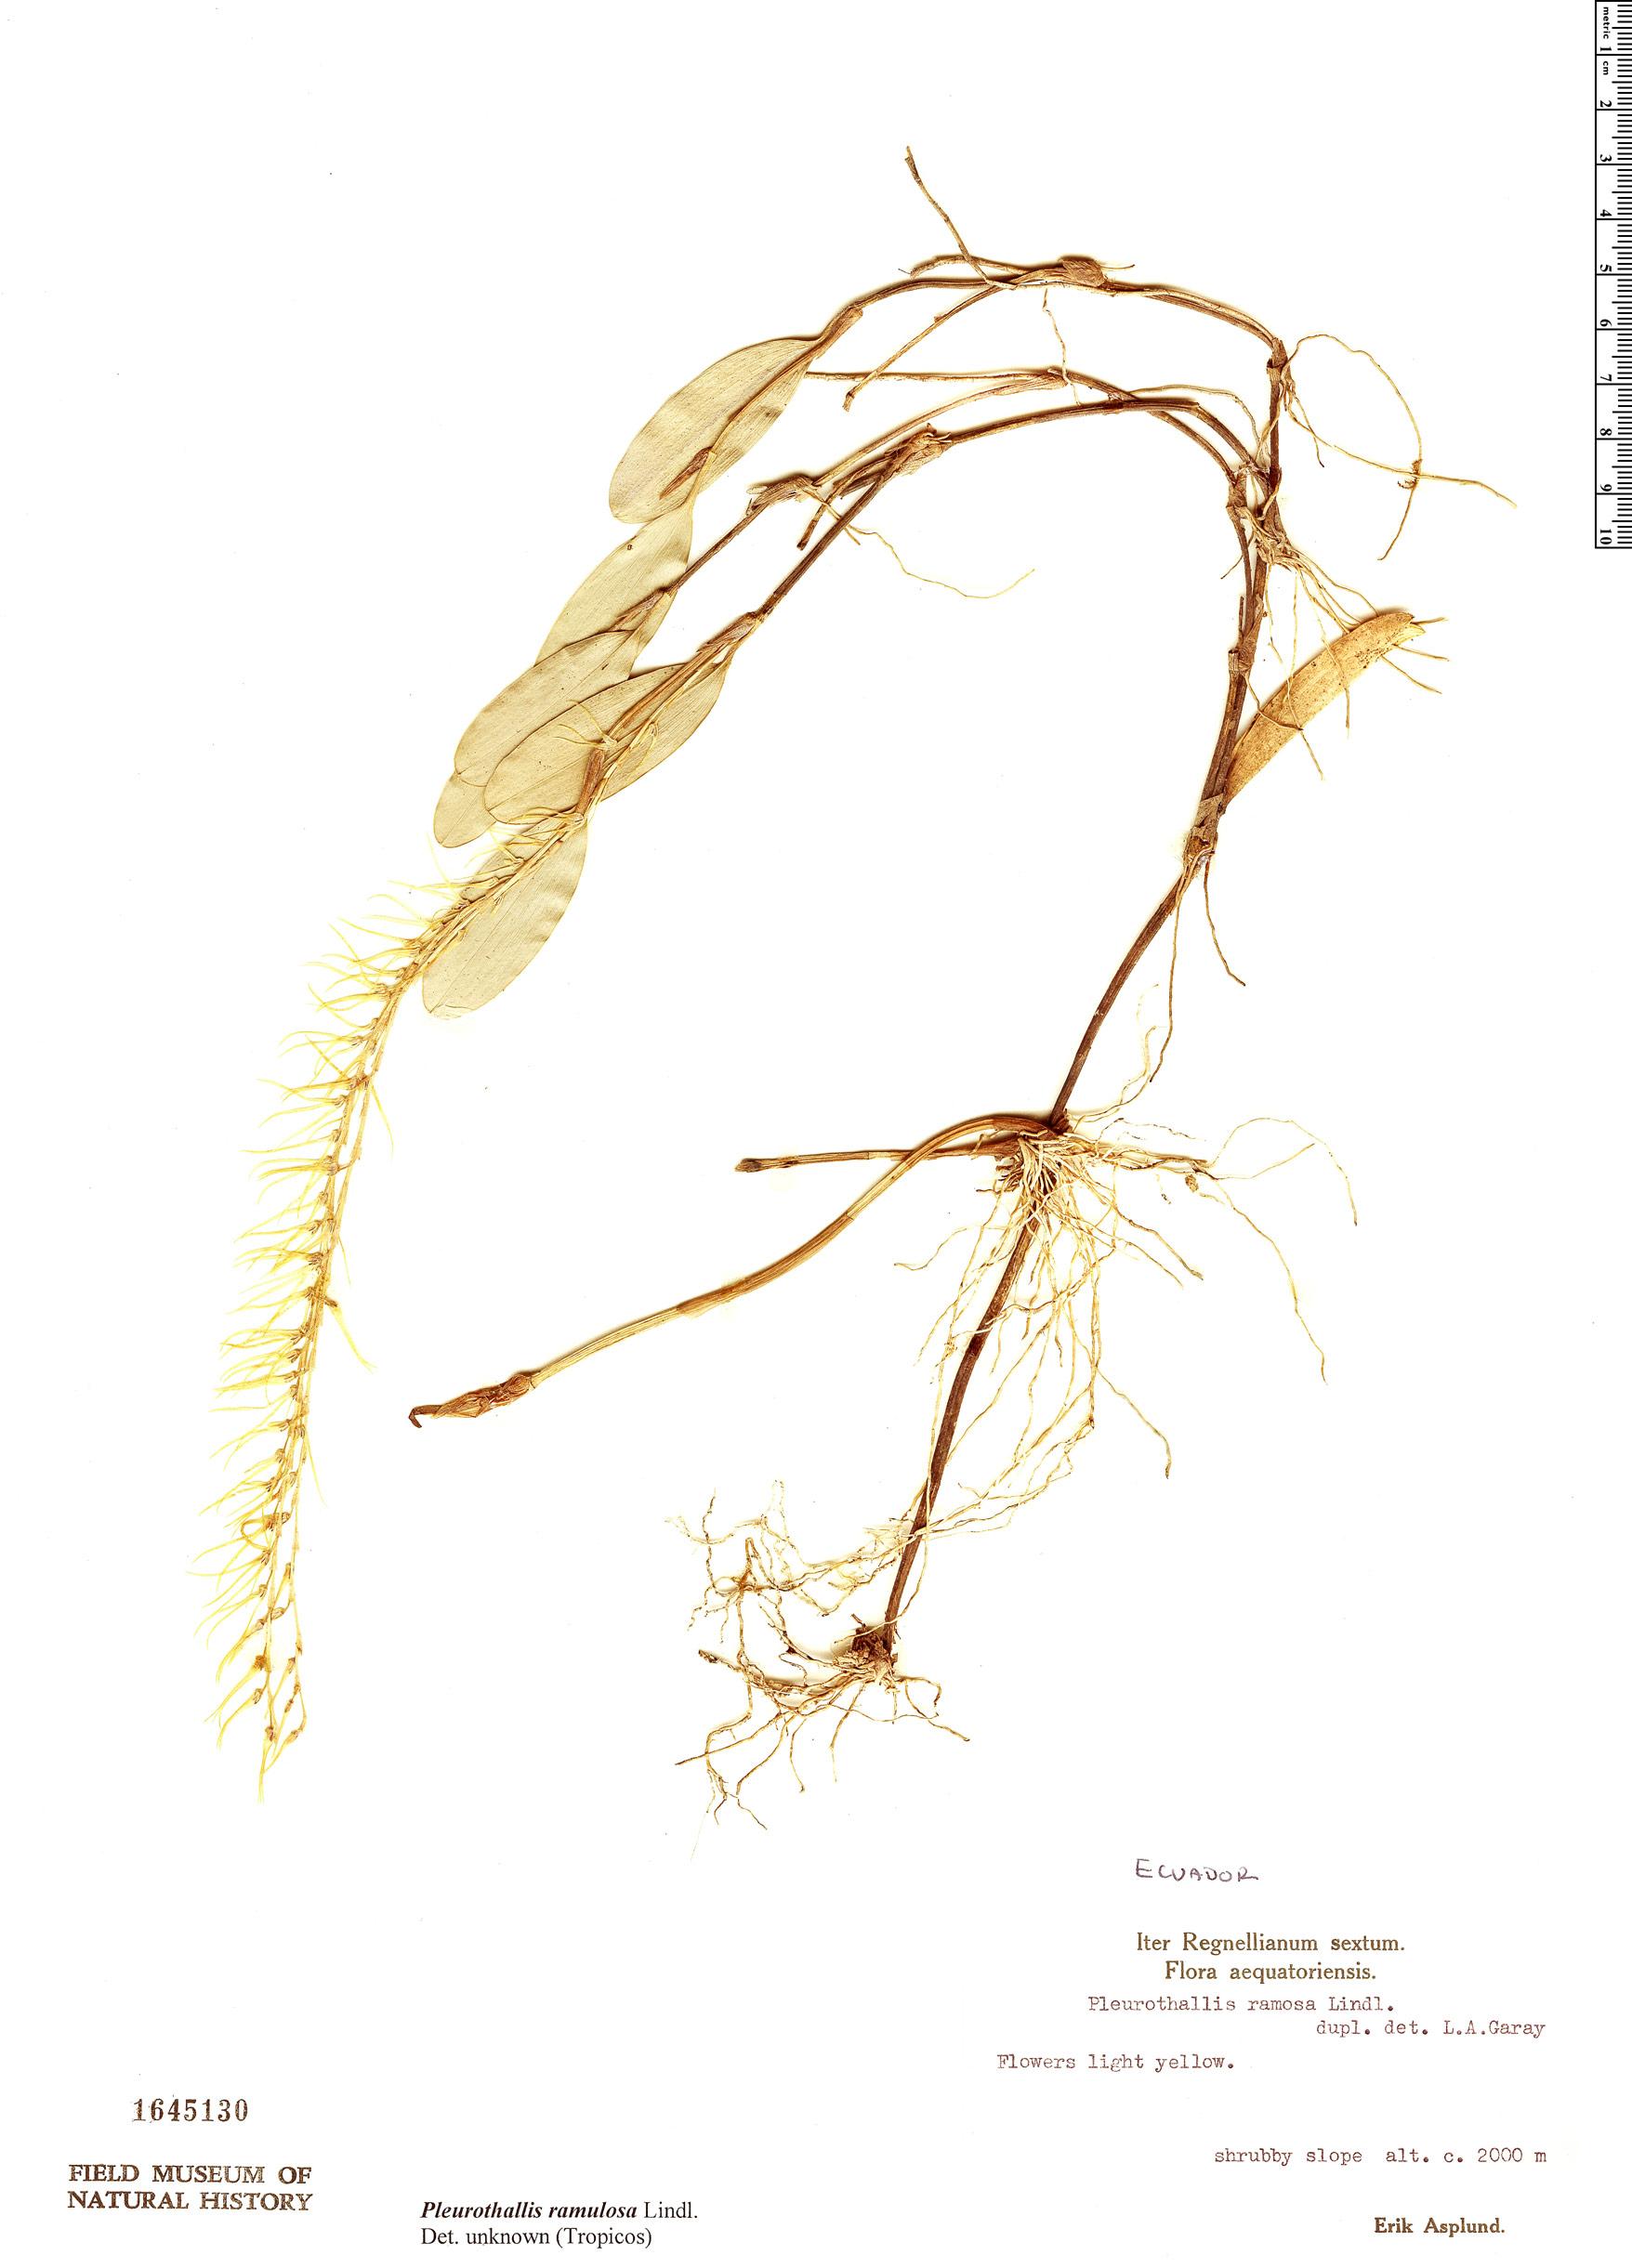 Specimen: Pleurothallis ramulosa